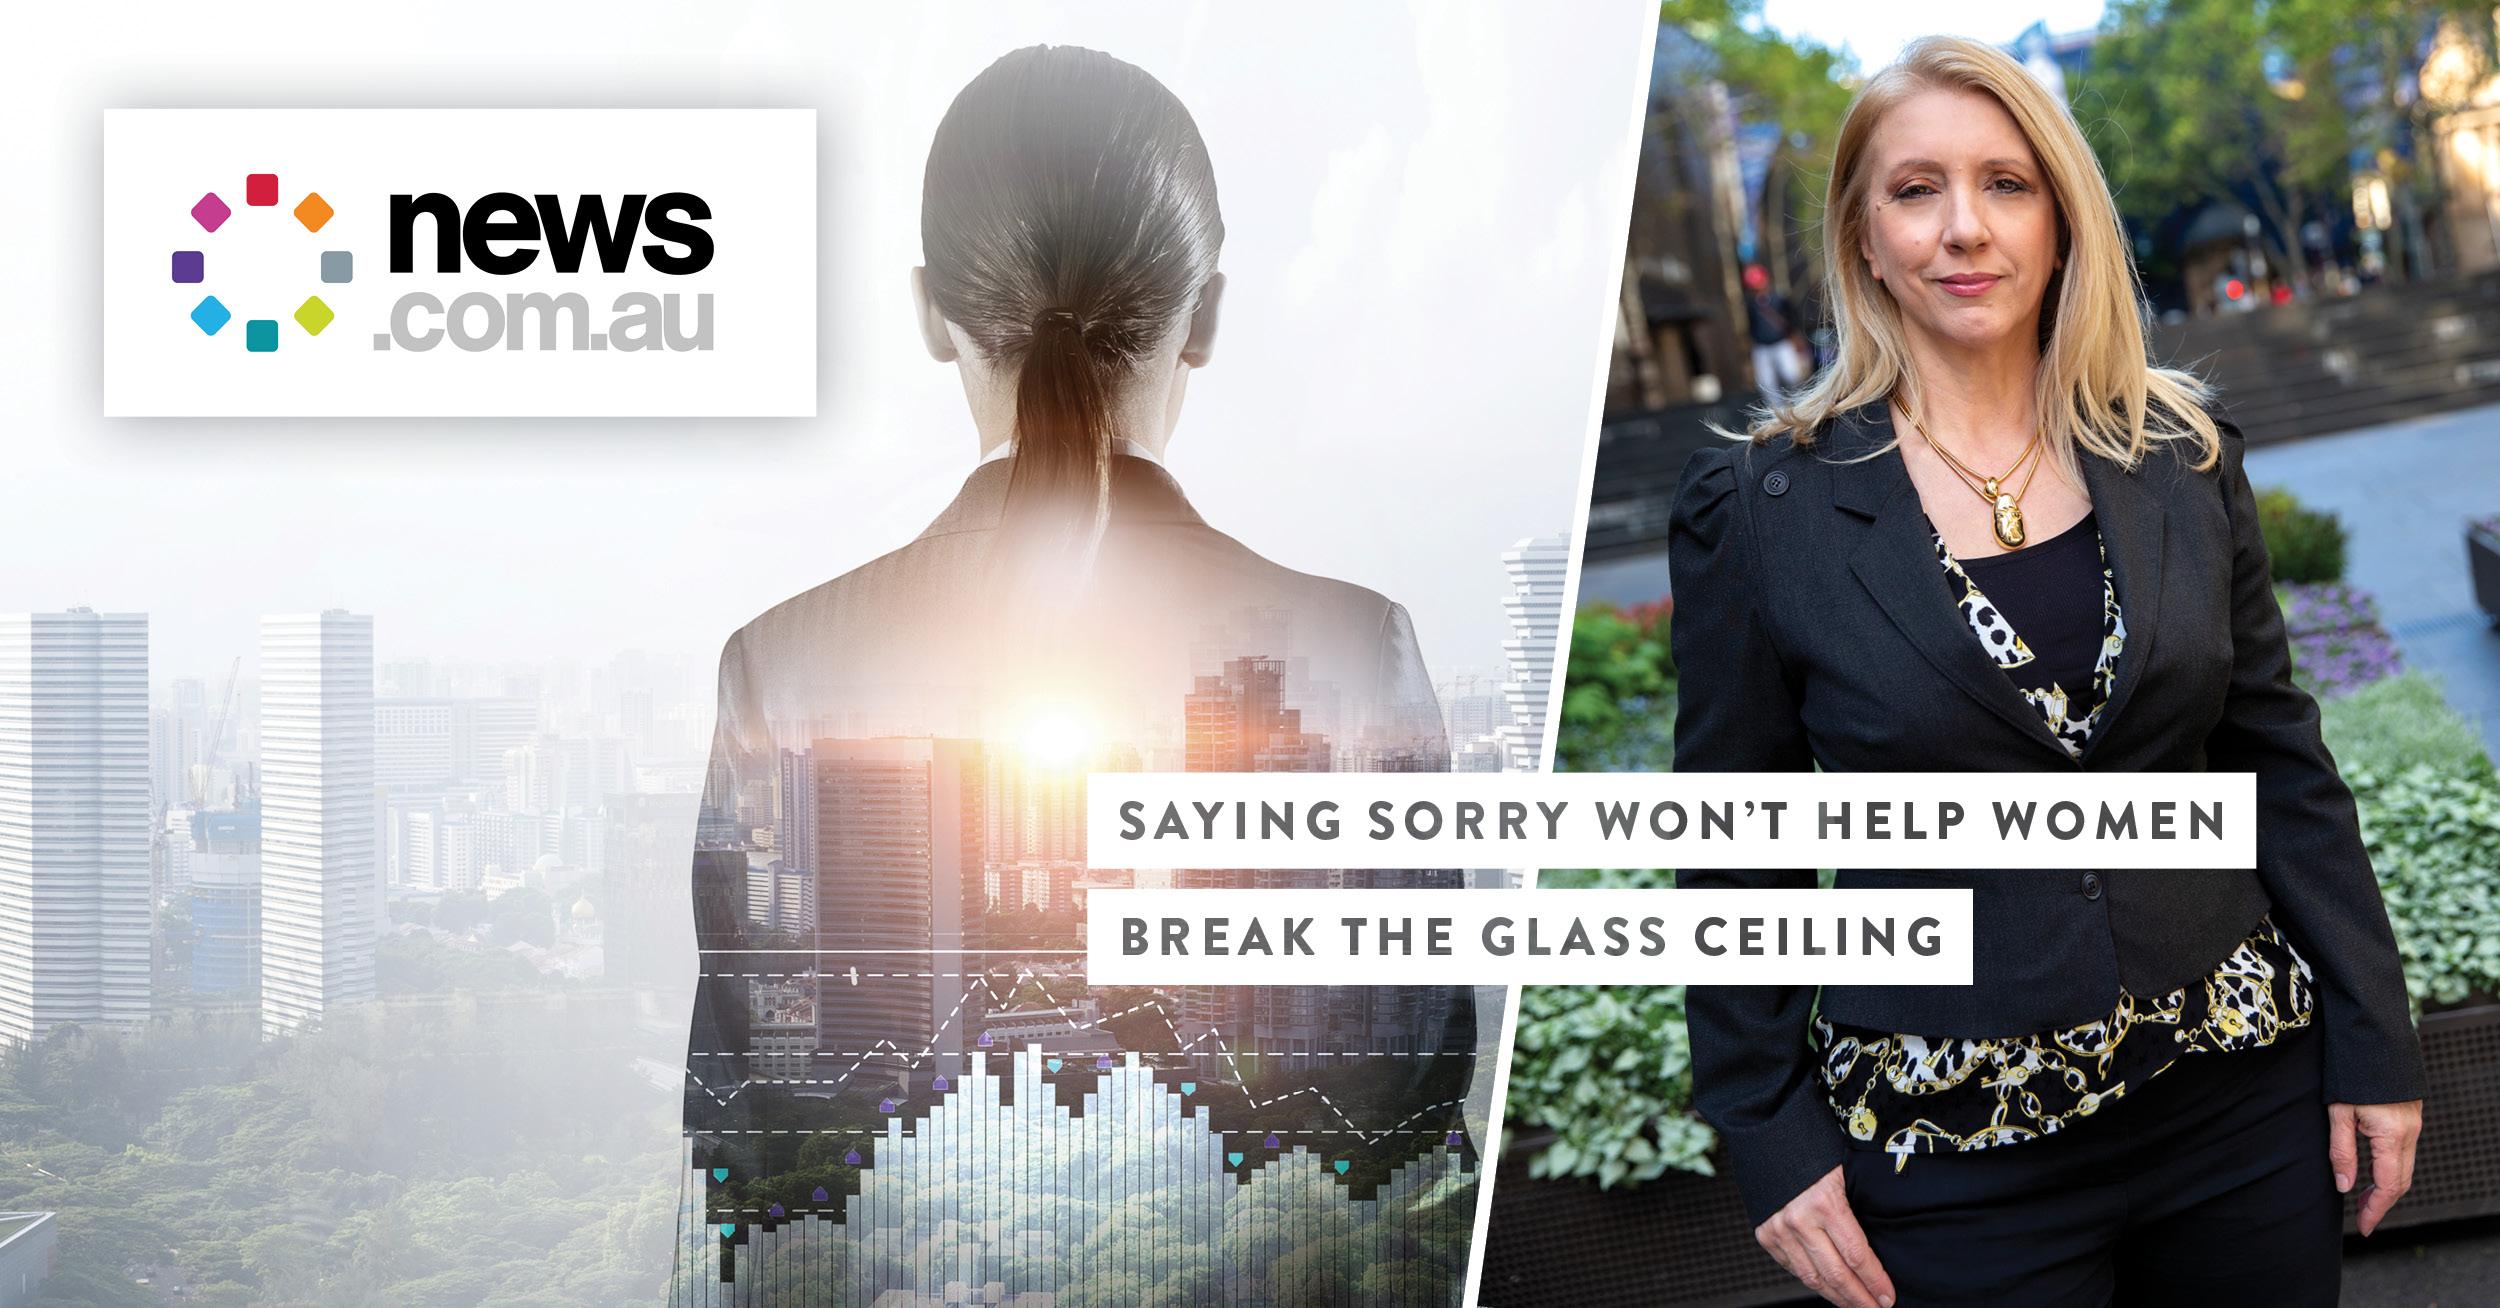 saying-sorry-wont-help-women-break-the-glass-ceiling